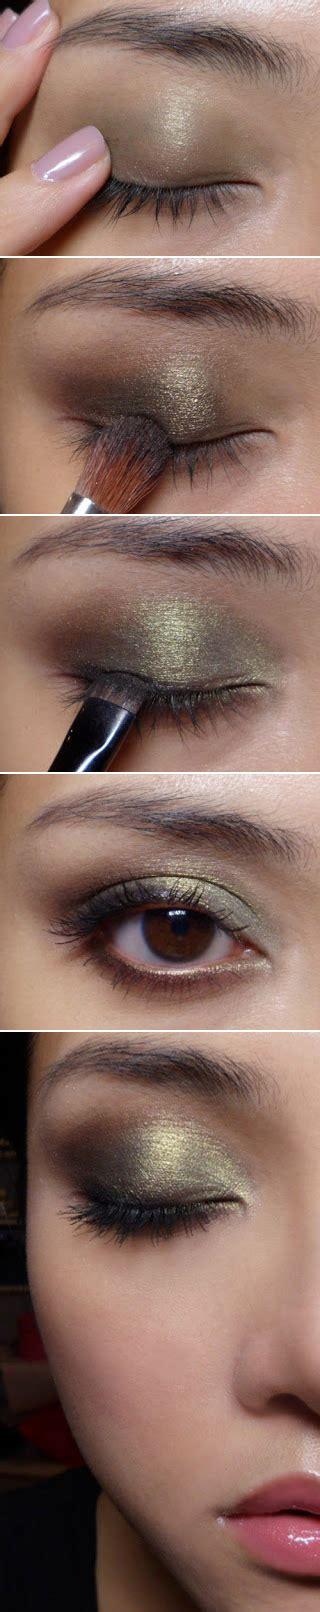 eyeliner tutorial buzzfeed 22 beauty tutorials for dramatic holiday looks